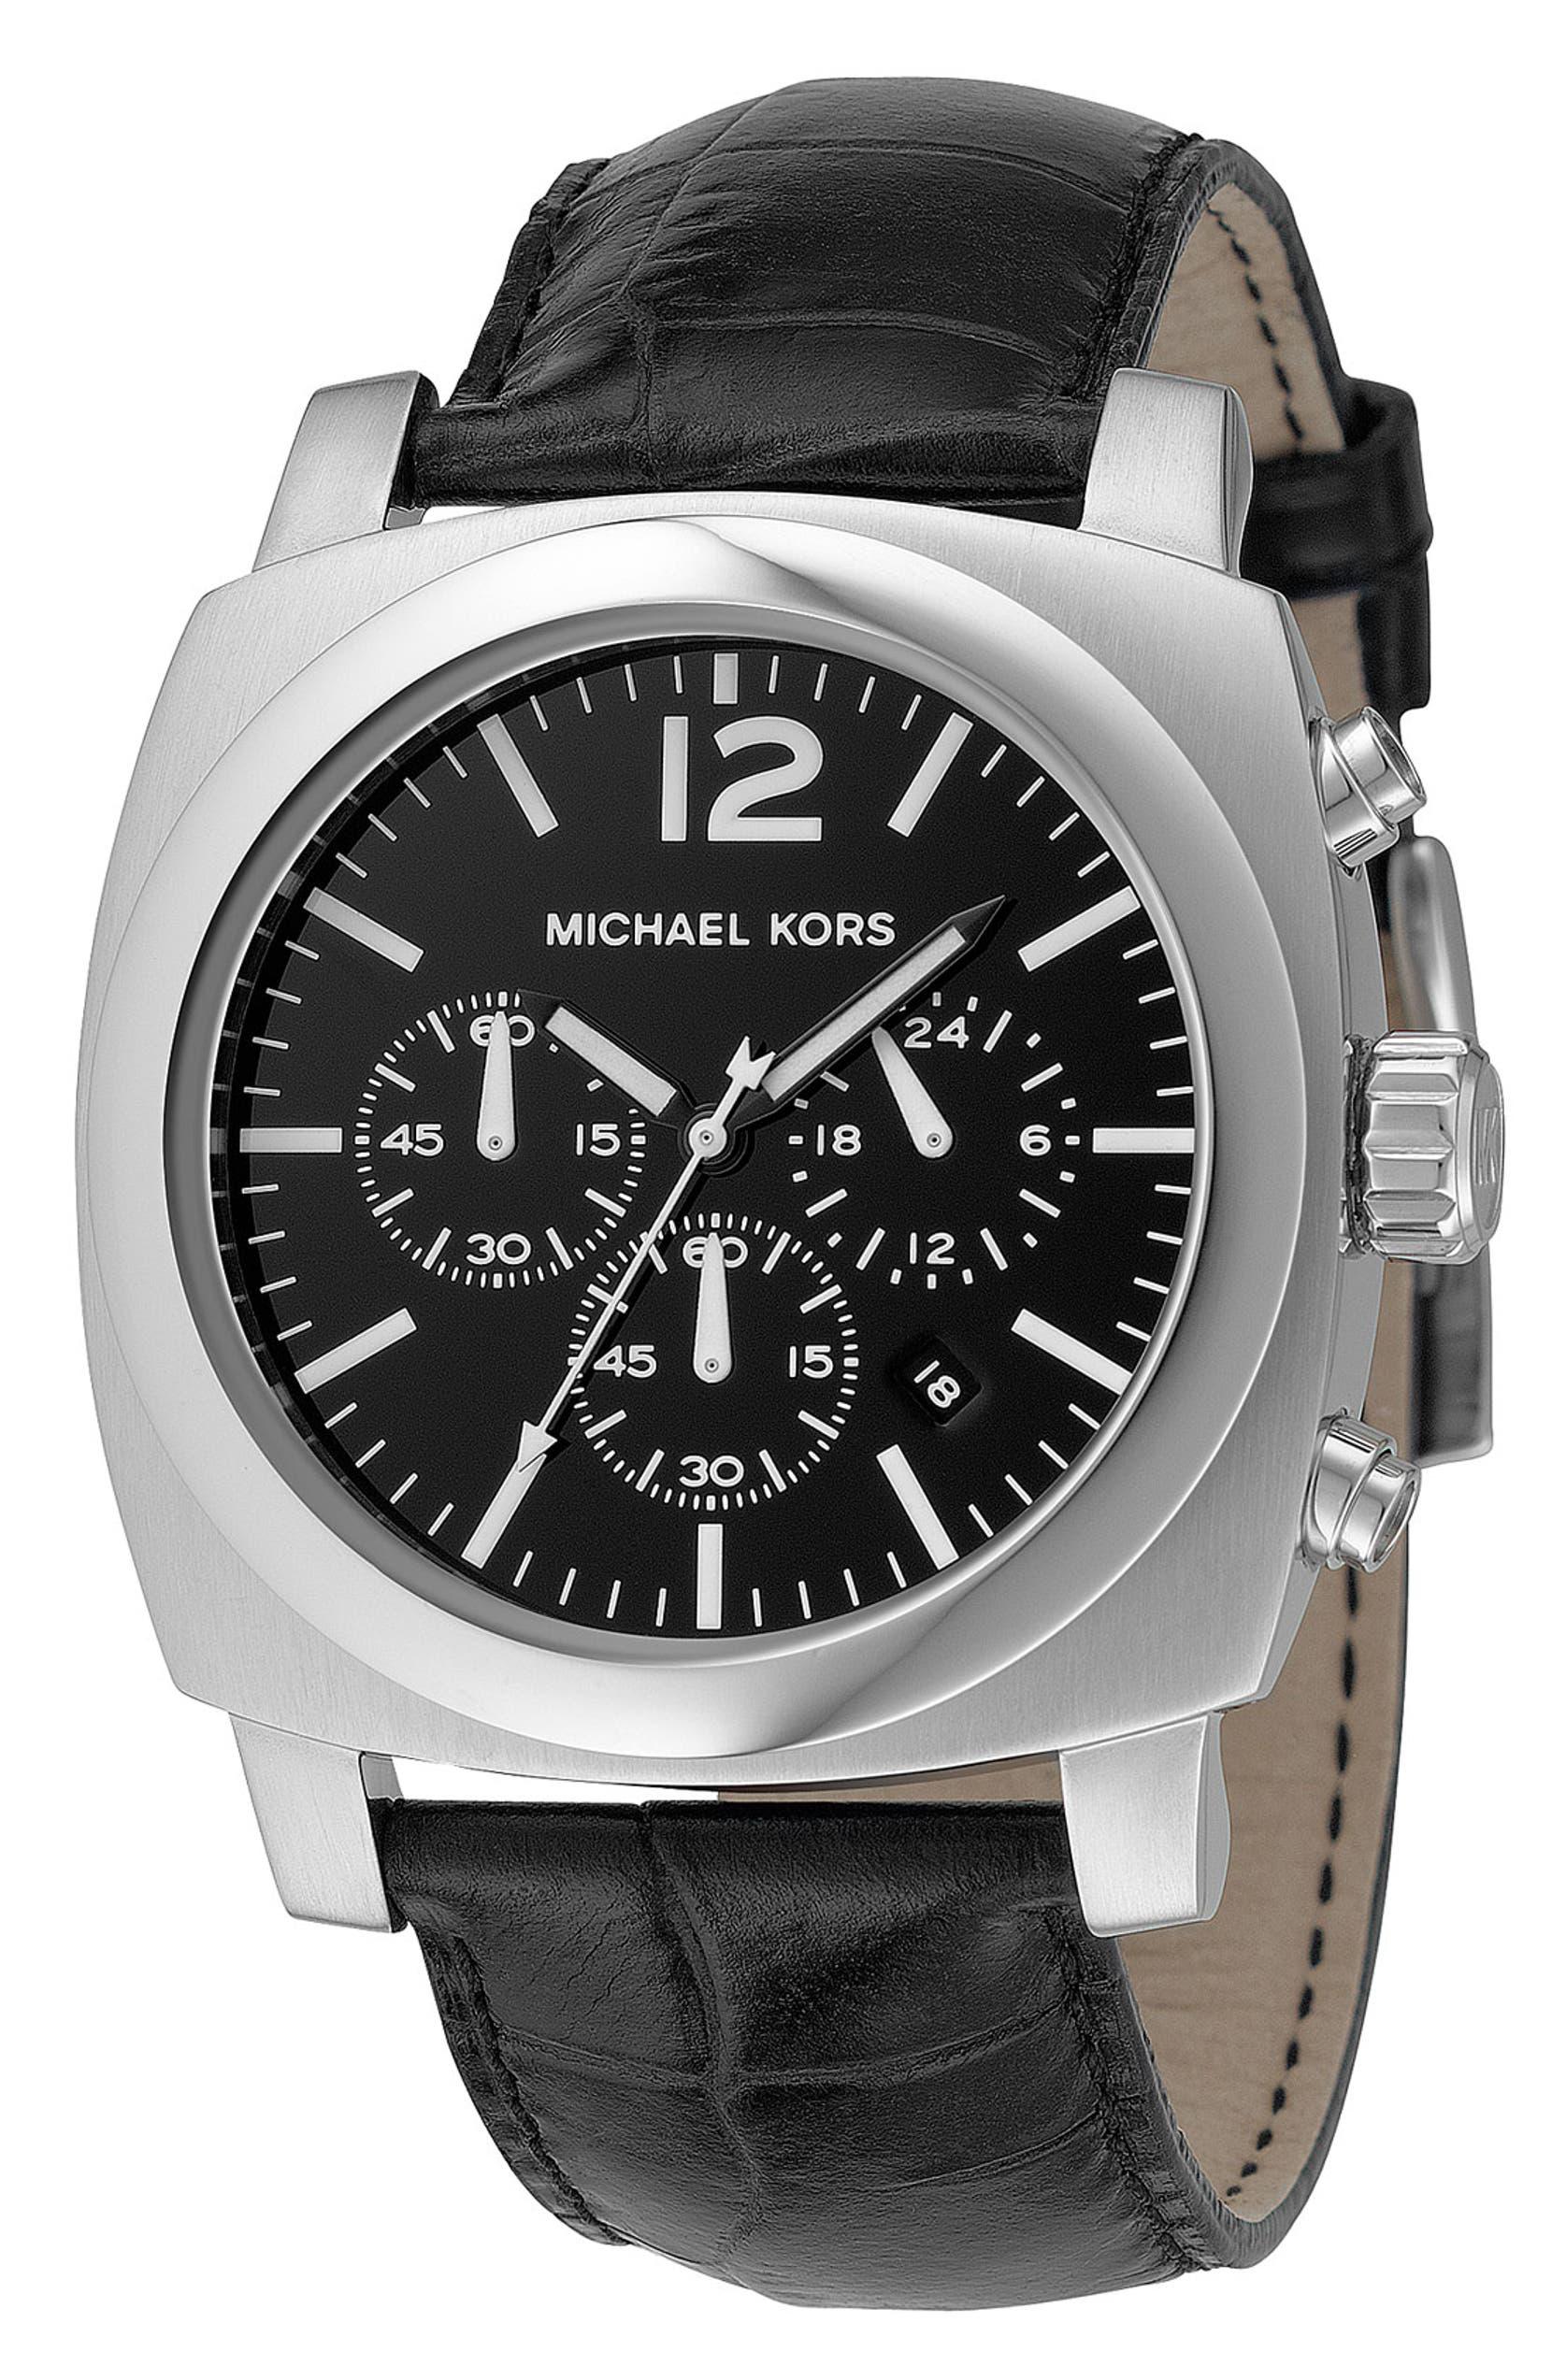 23ebe999cc61 Michael Kors Men s Chronograph Watch